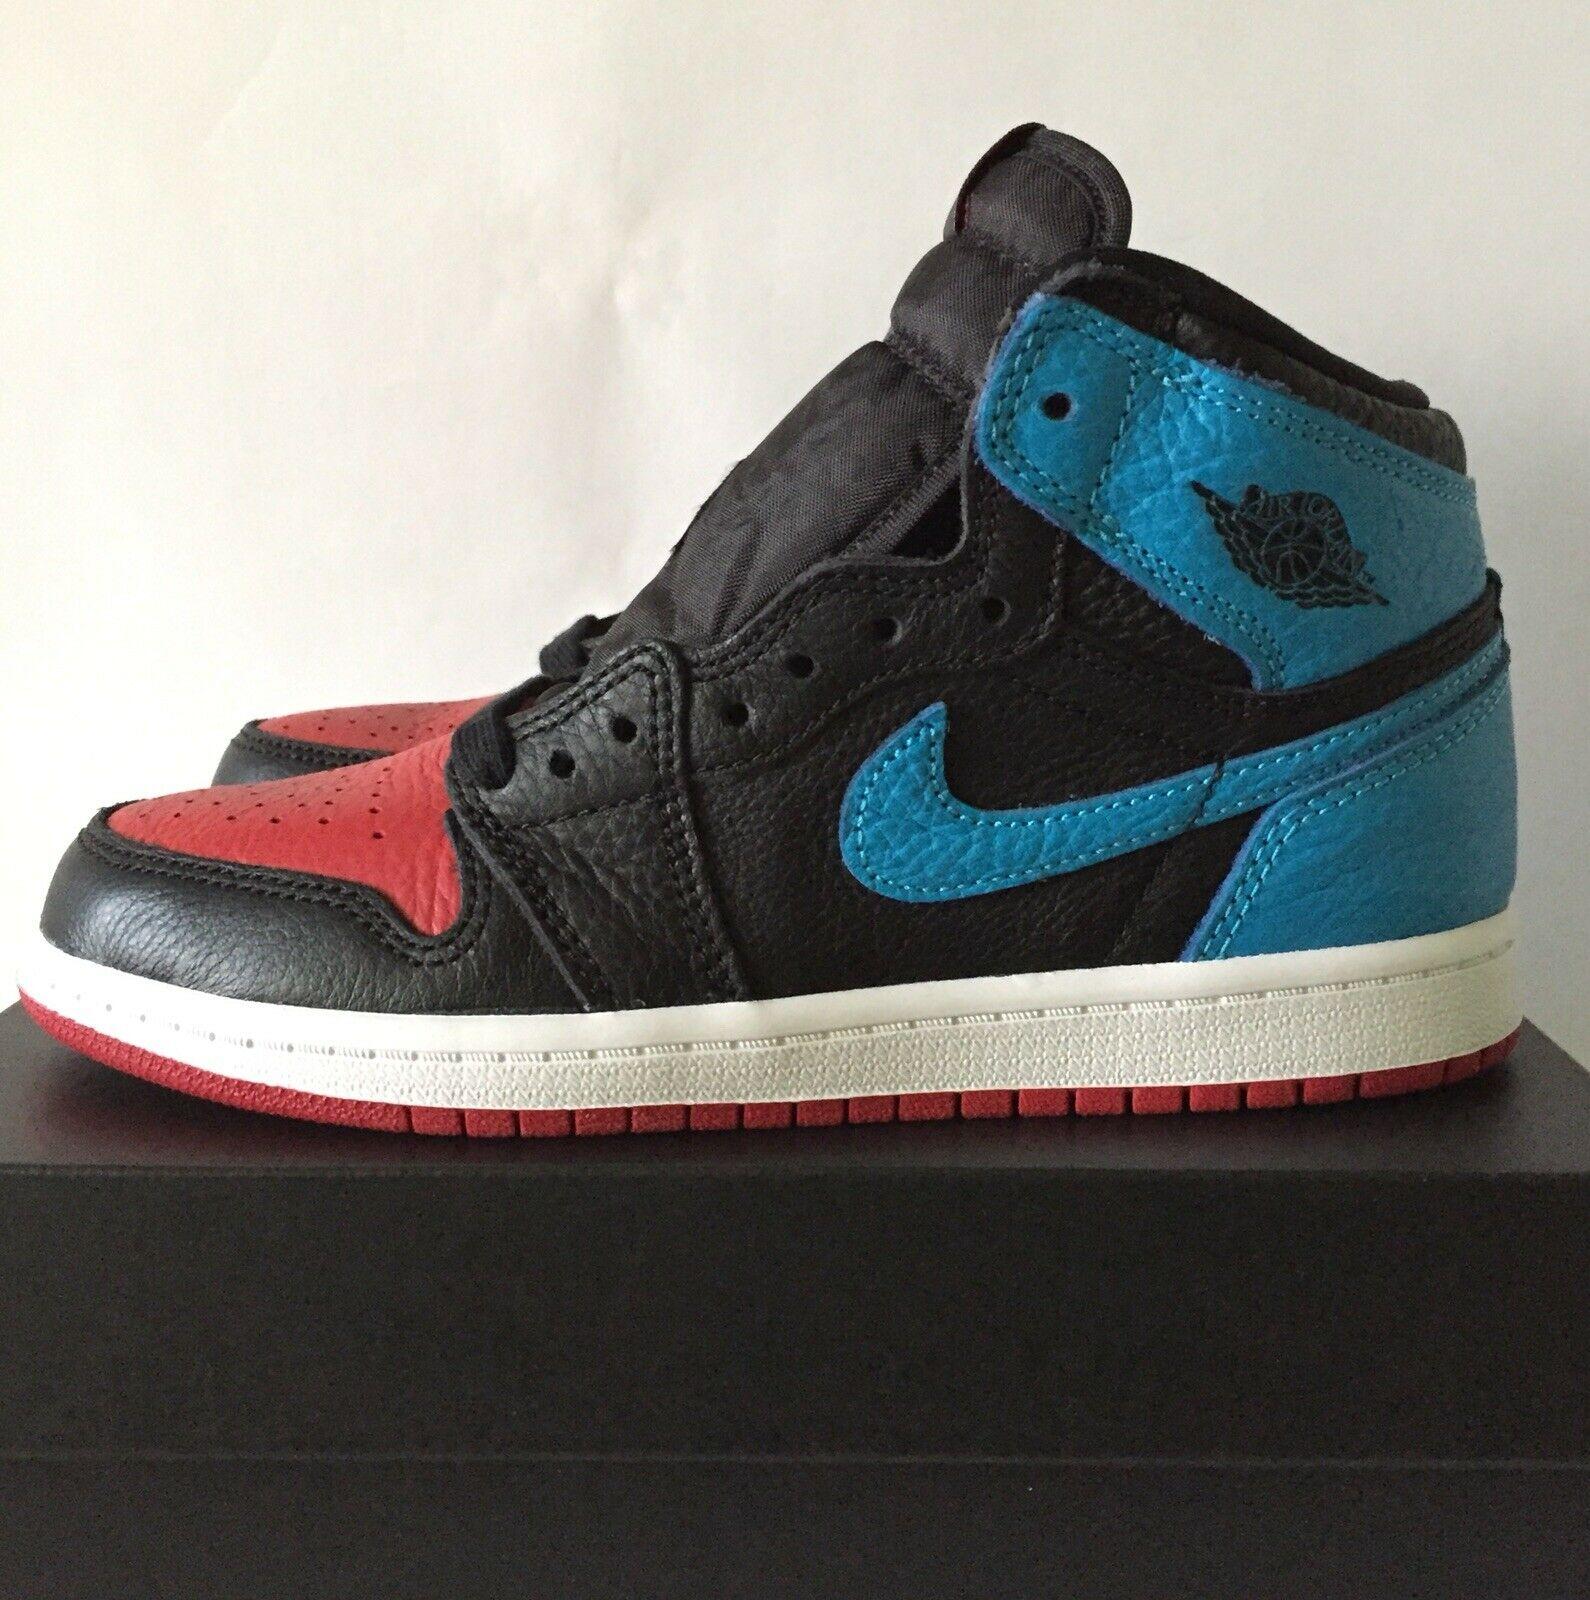 Jordan 1 Retro High UNC Chicago Leather PS